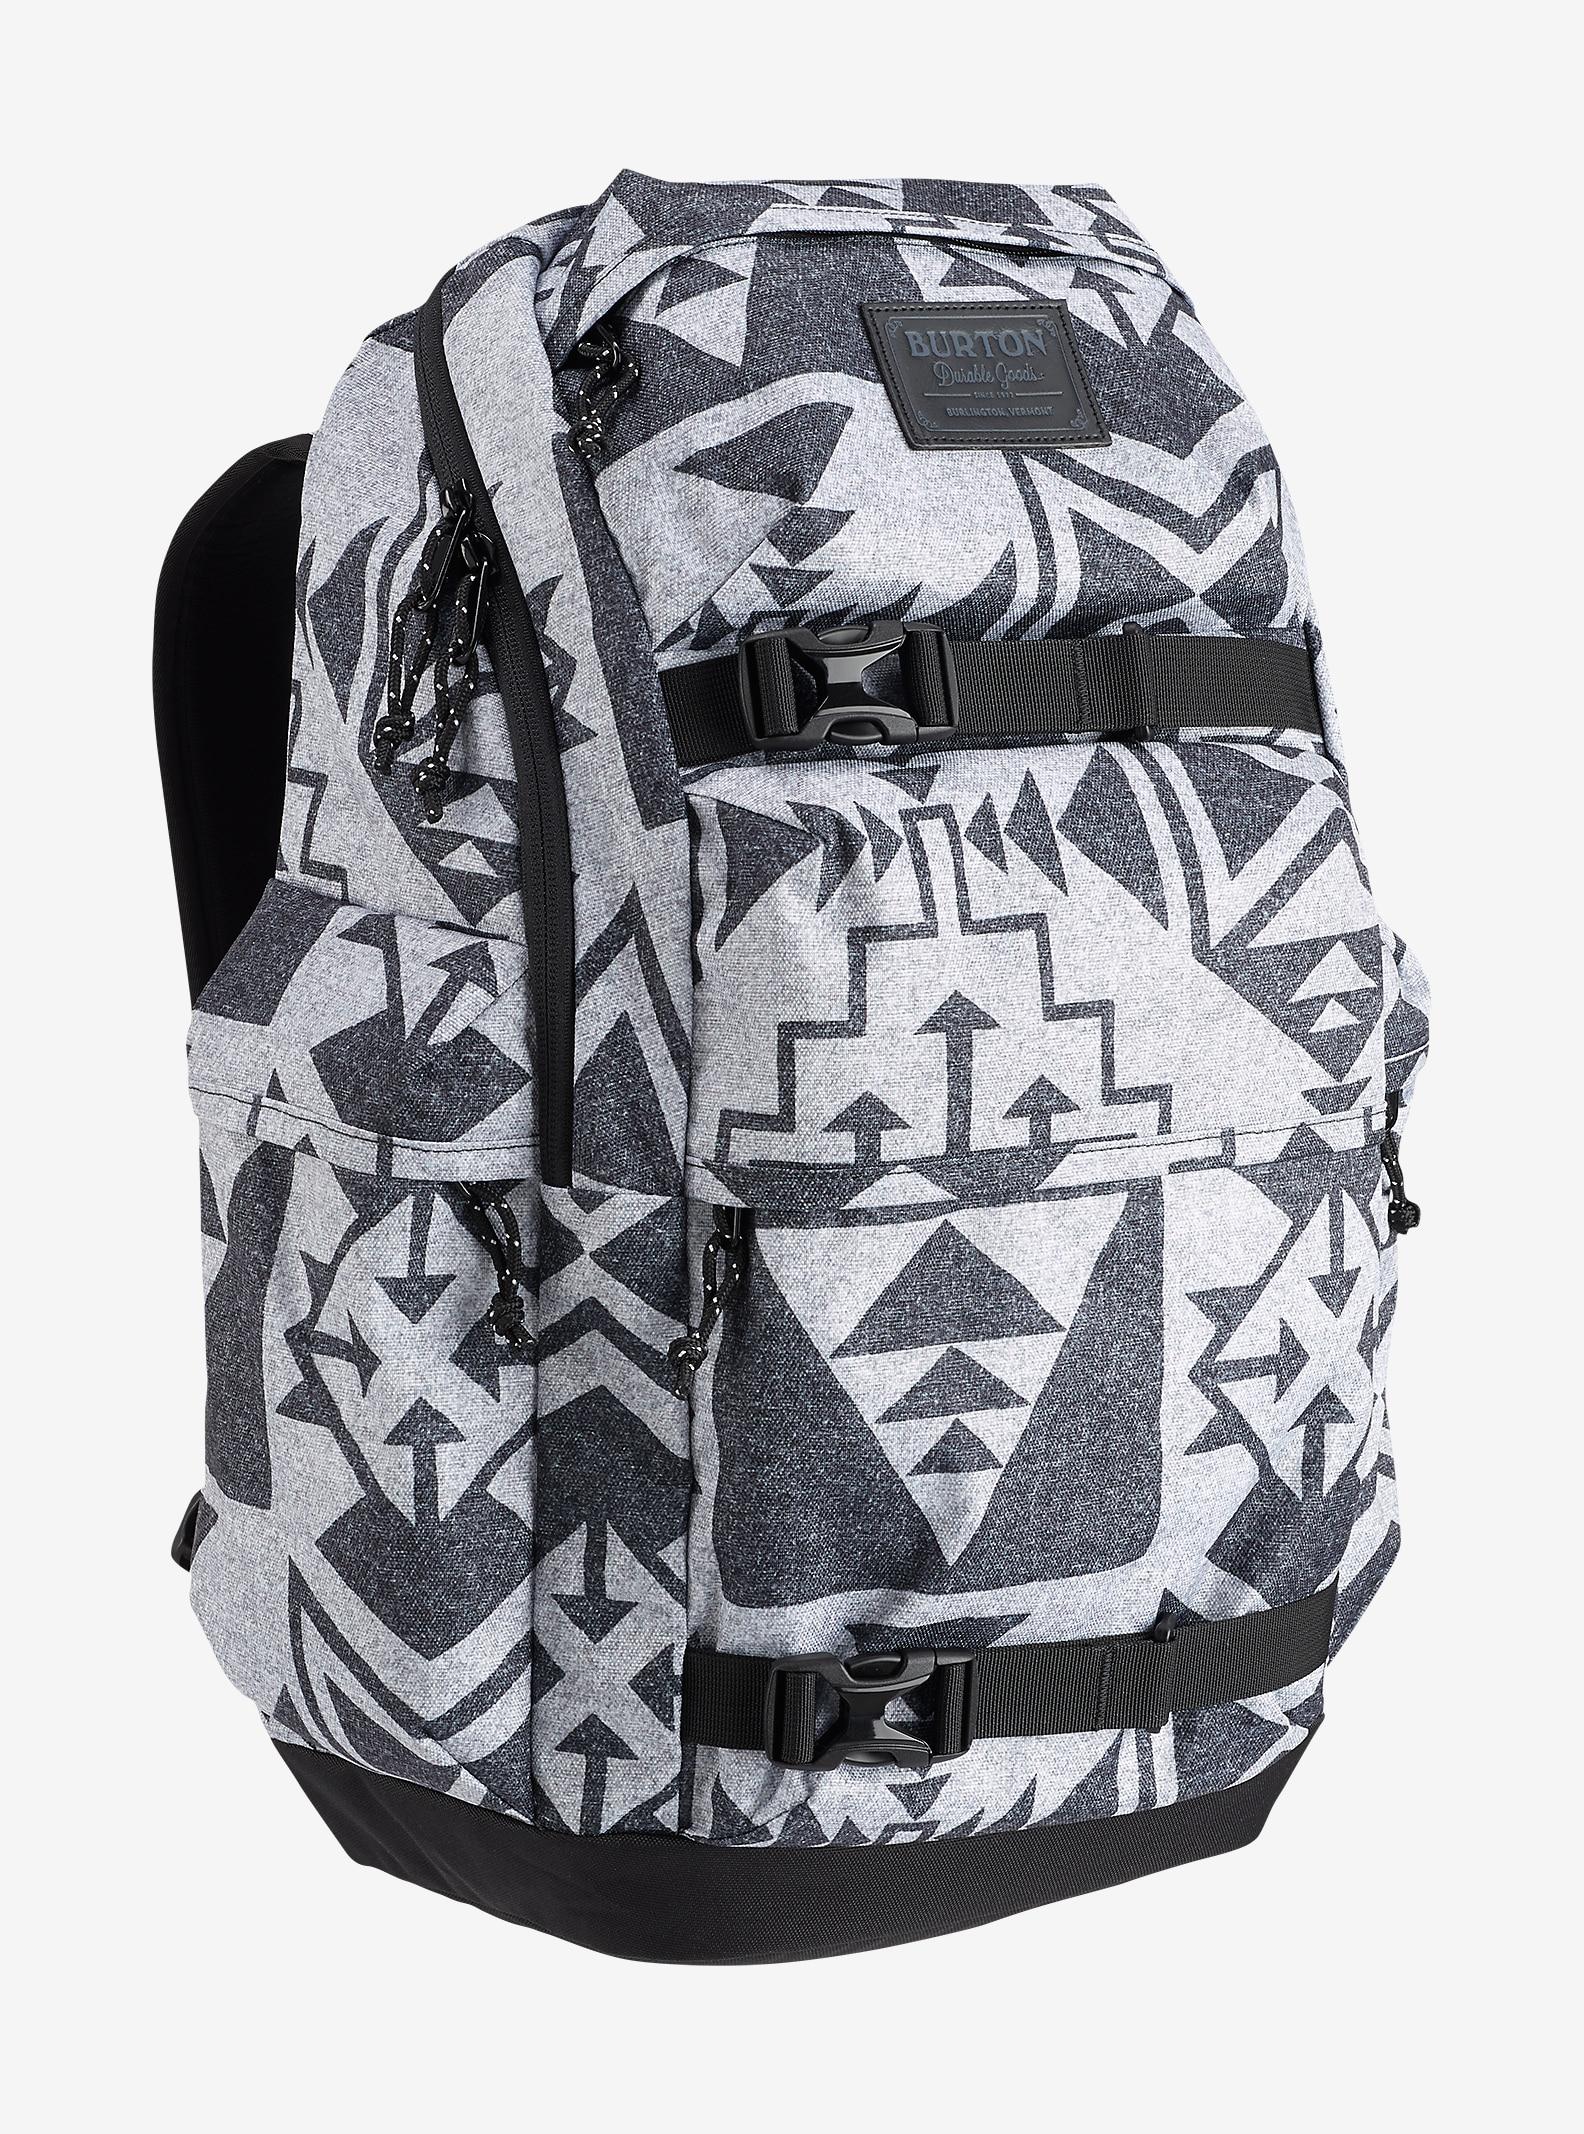 Burton Kilo Backpack shown in Neu Nordic Print